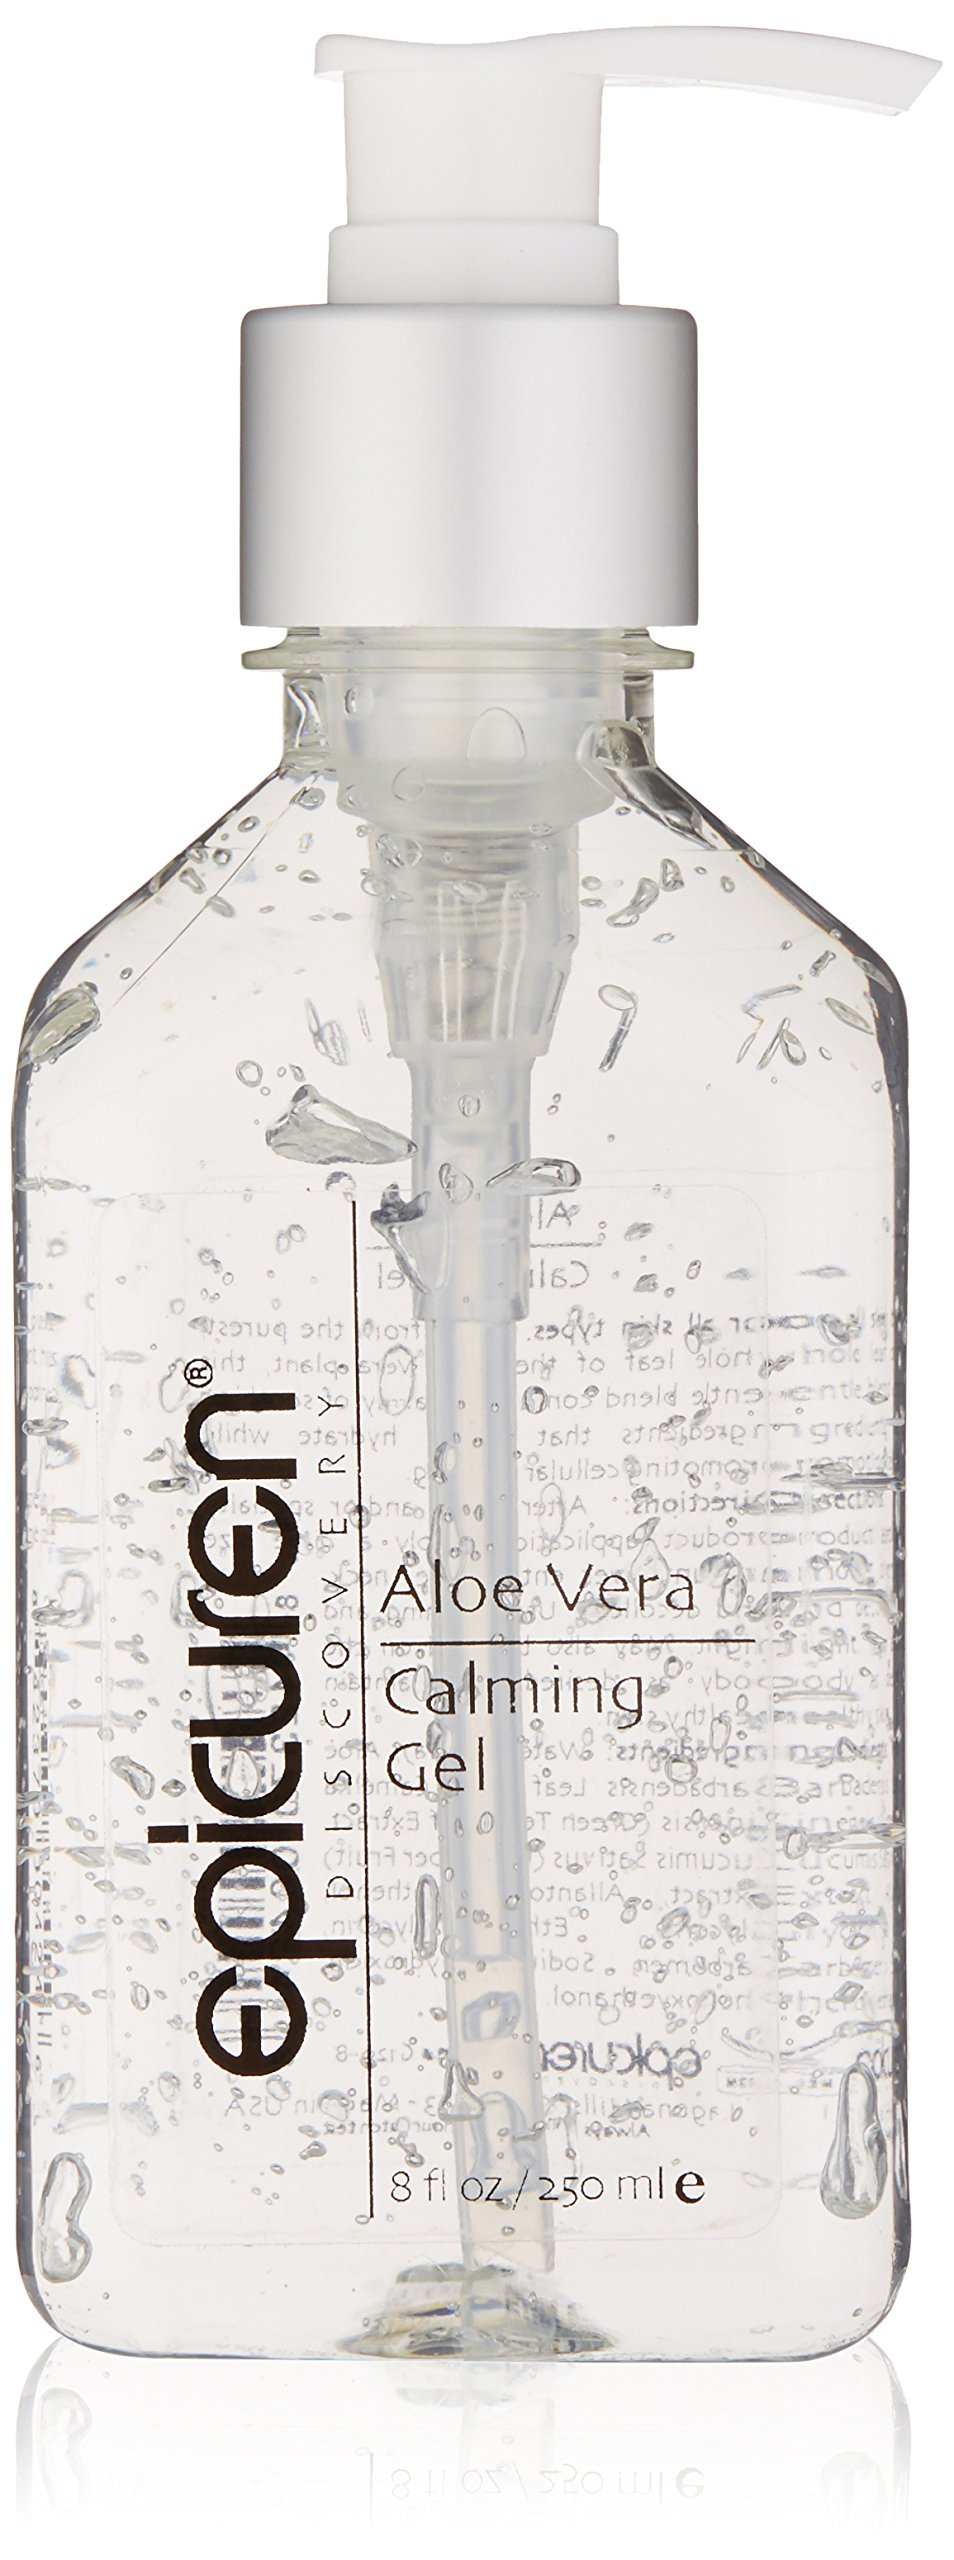 Epicuren Discovery Aloe Vera Calming Gel , 8 Fl oz by epicuren DISCOVERY